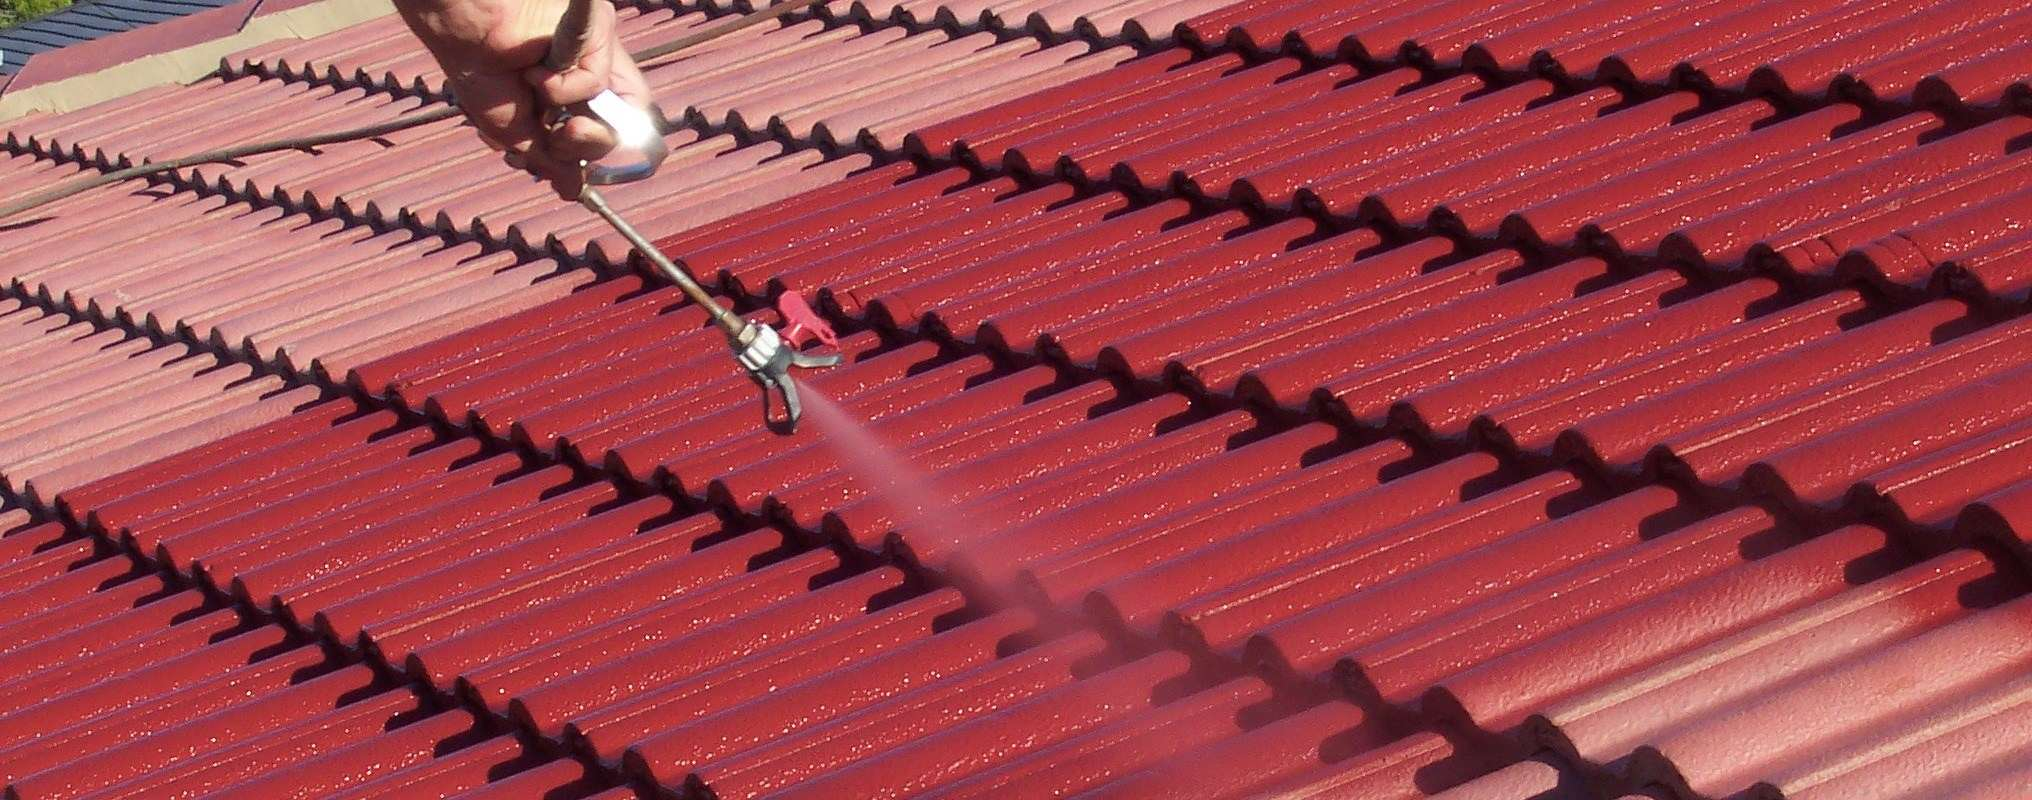 Roof Restoration for Tiled Roofs